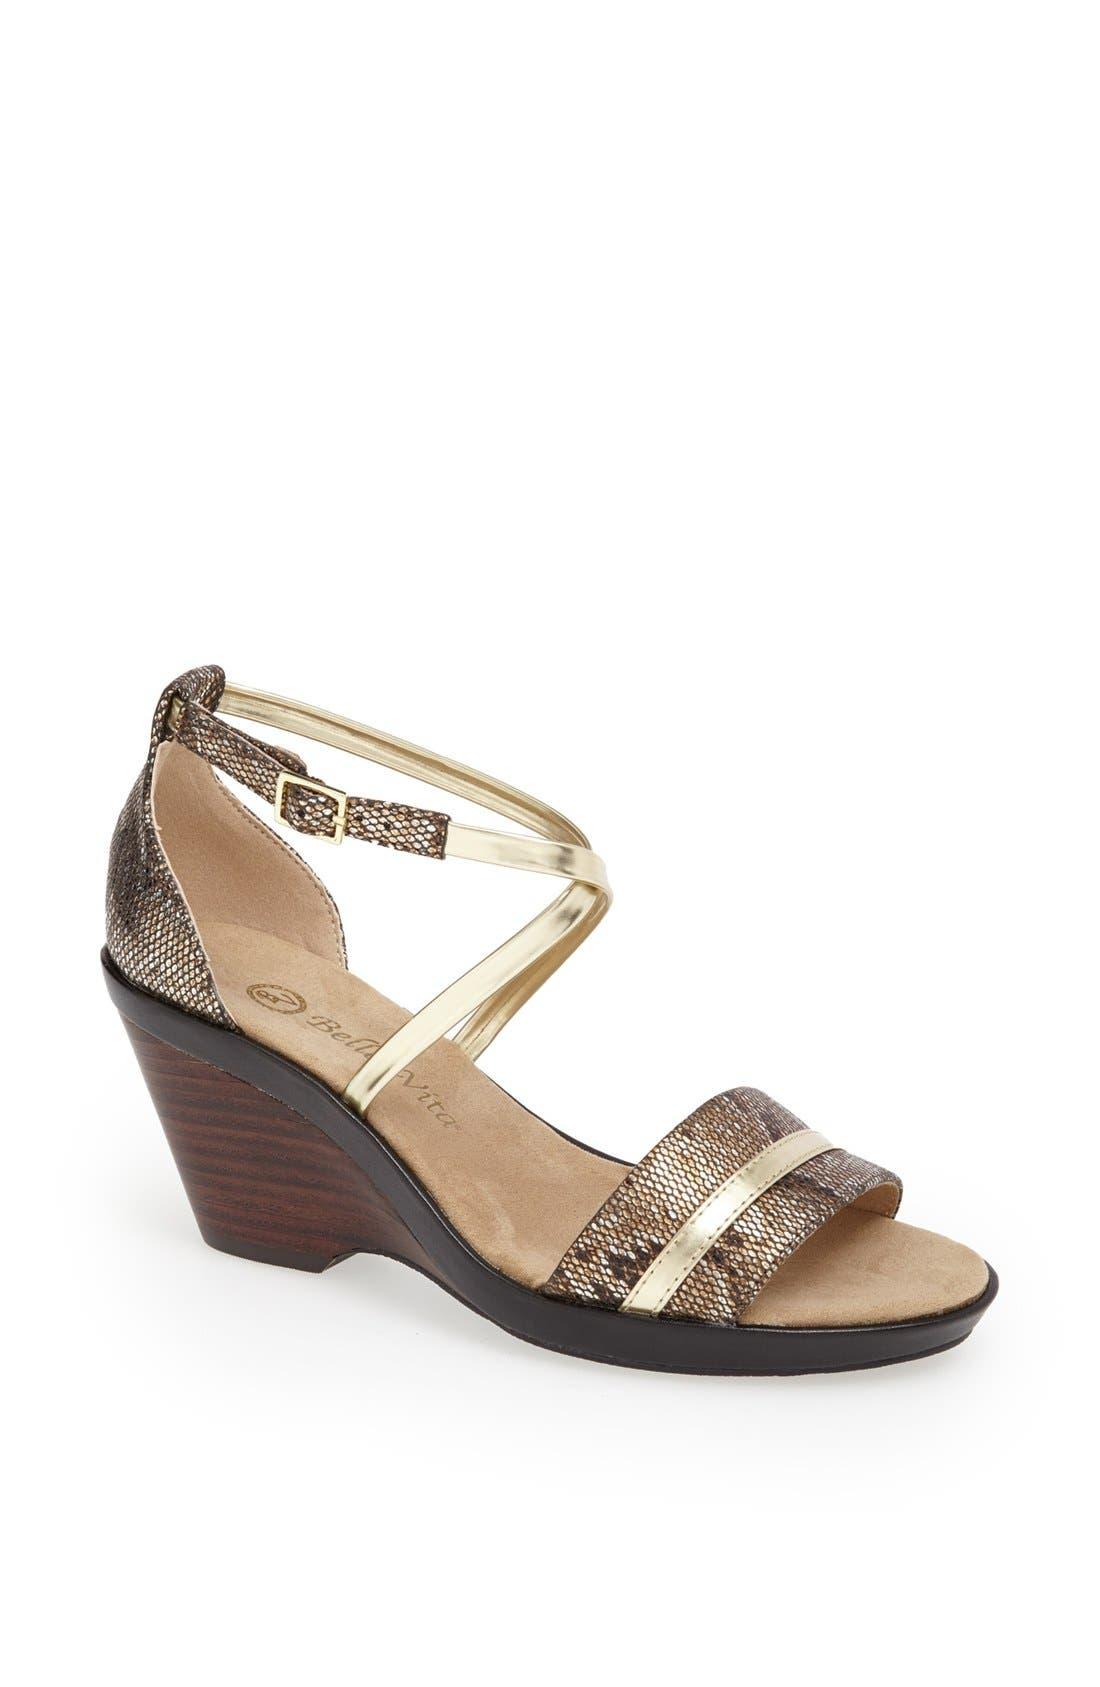 Alternate Image 1 Selected - Bella Vita 'Jozie II' Sandal